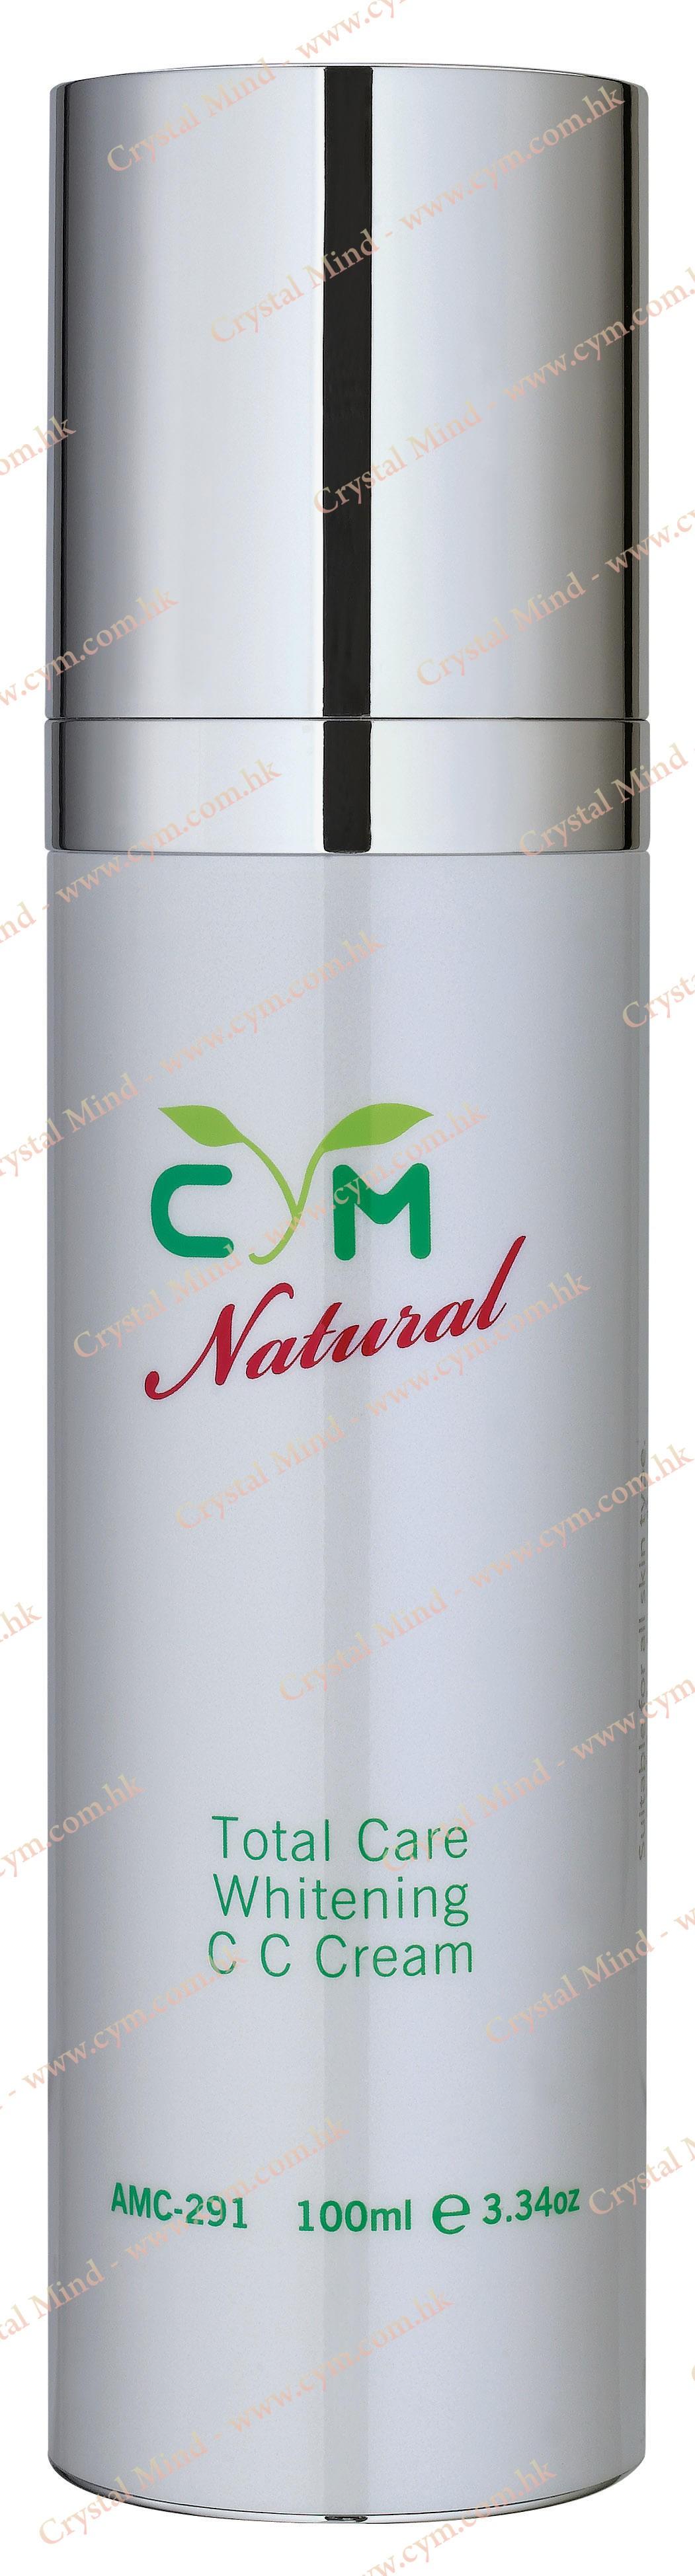 全效美白CC 霜 Total Care Whitening C C Cream - 100 ml - AMC-291